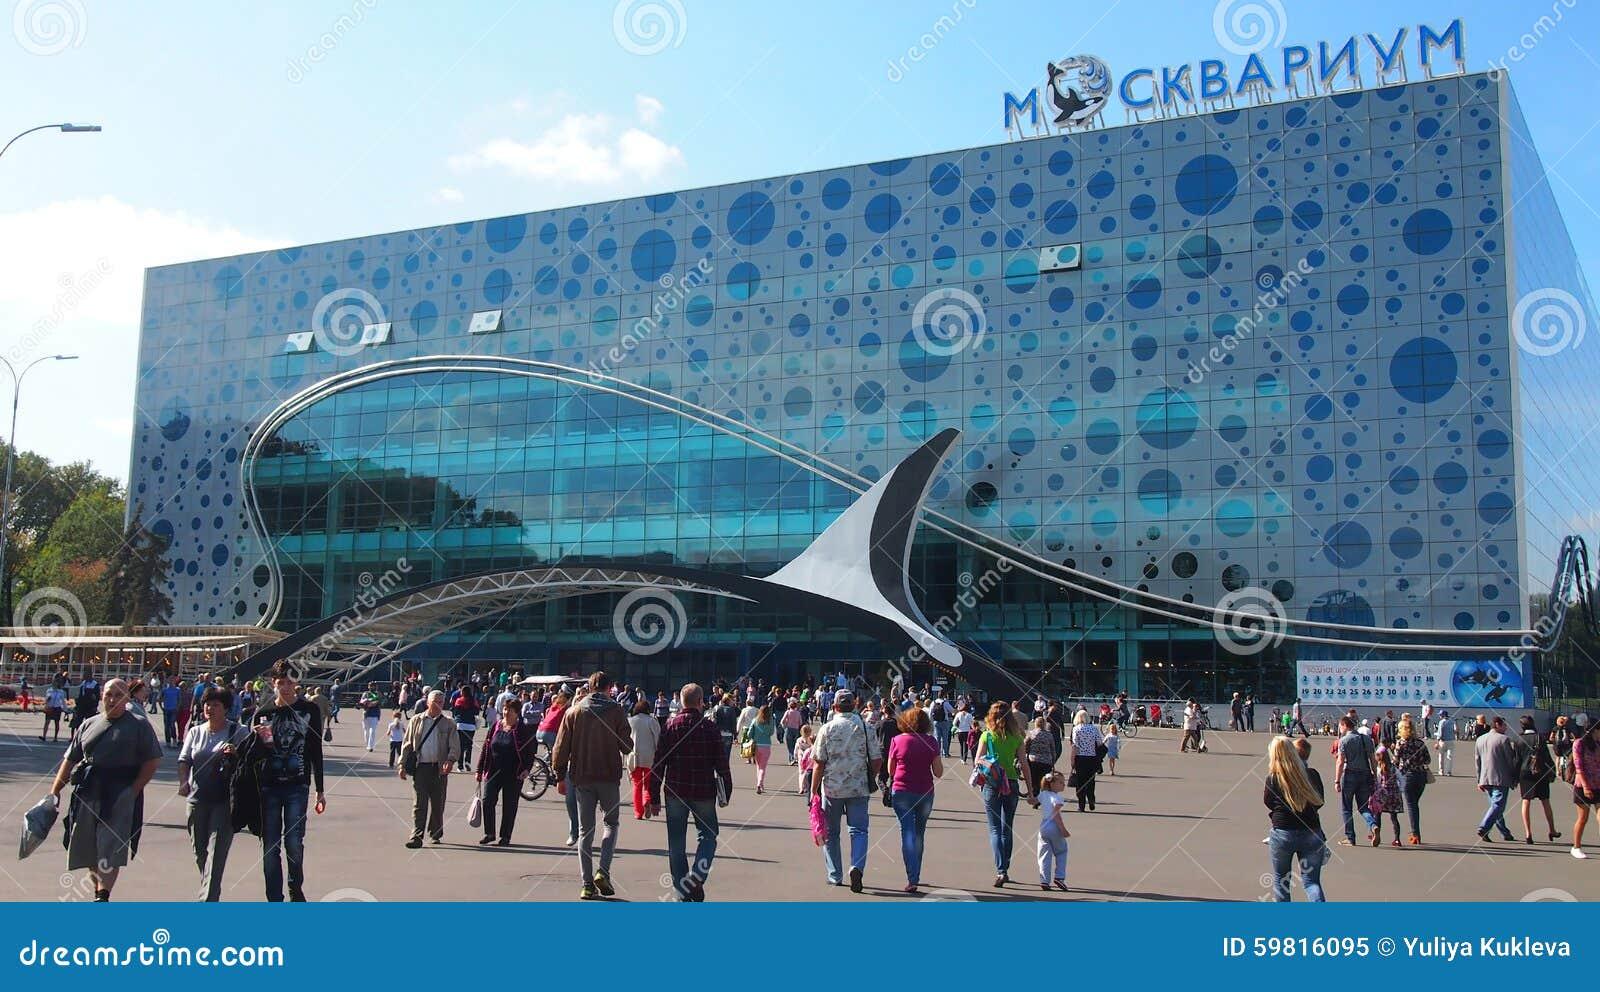 Oceanarium in St. Petersburg: address, photo, reviews 30